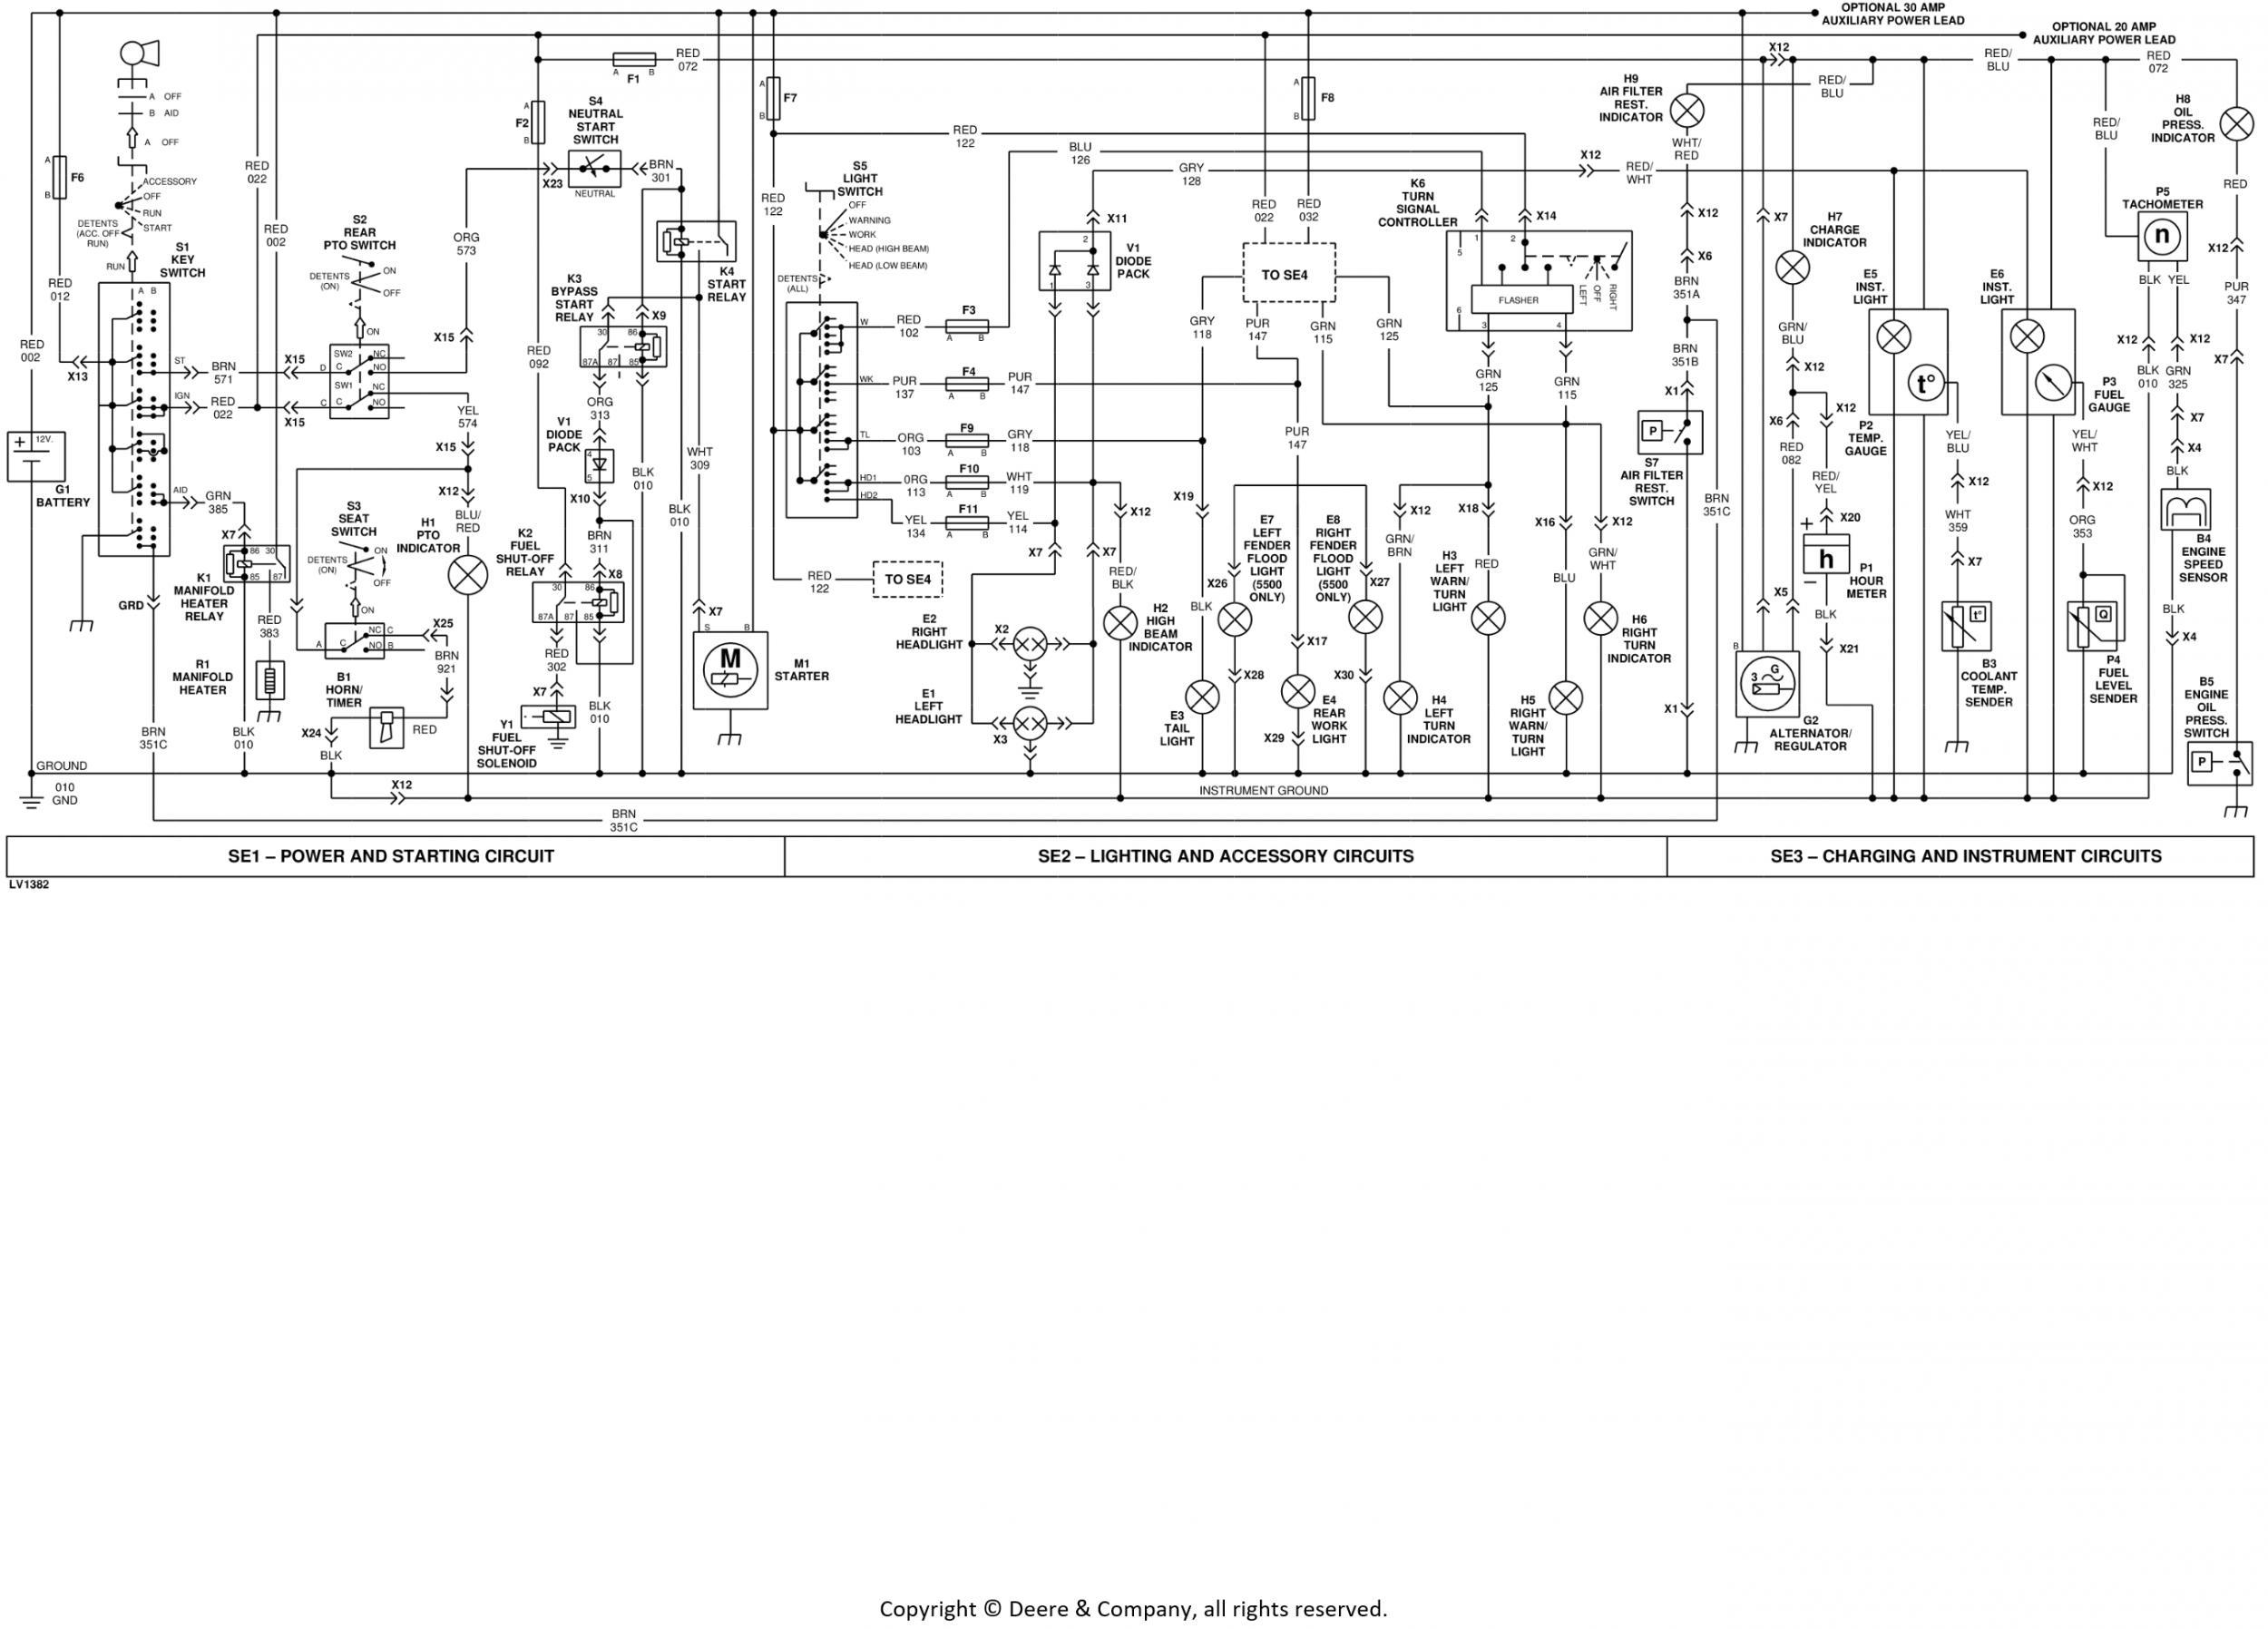 5400 Tachometer question..Please help!!